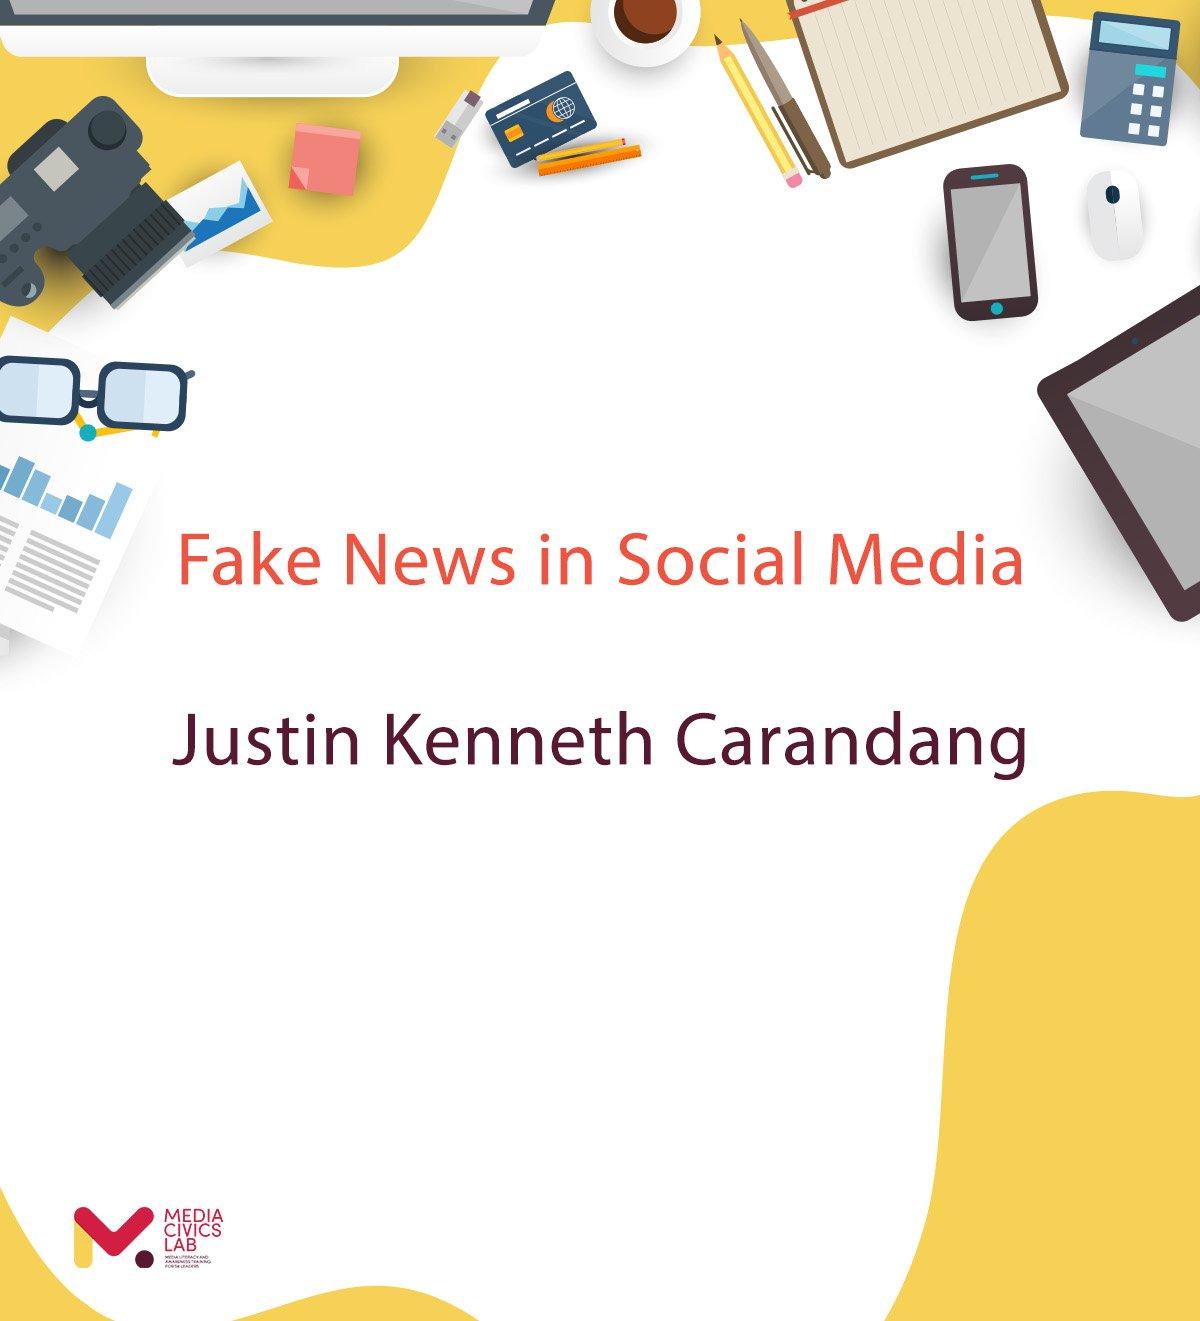 Fake News in Social Media – Justin Kenneth Carandang